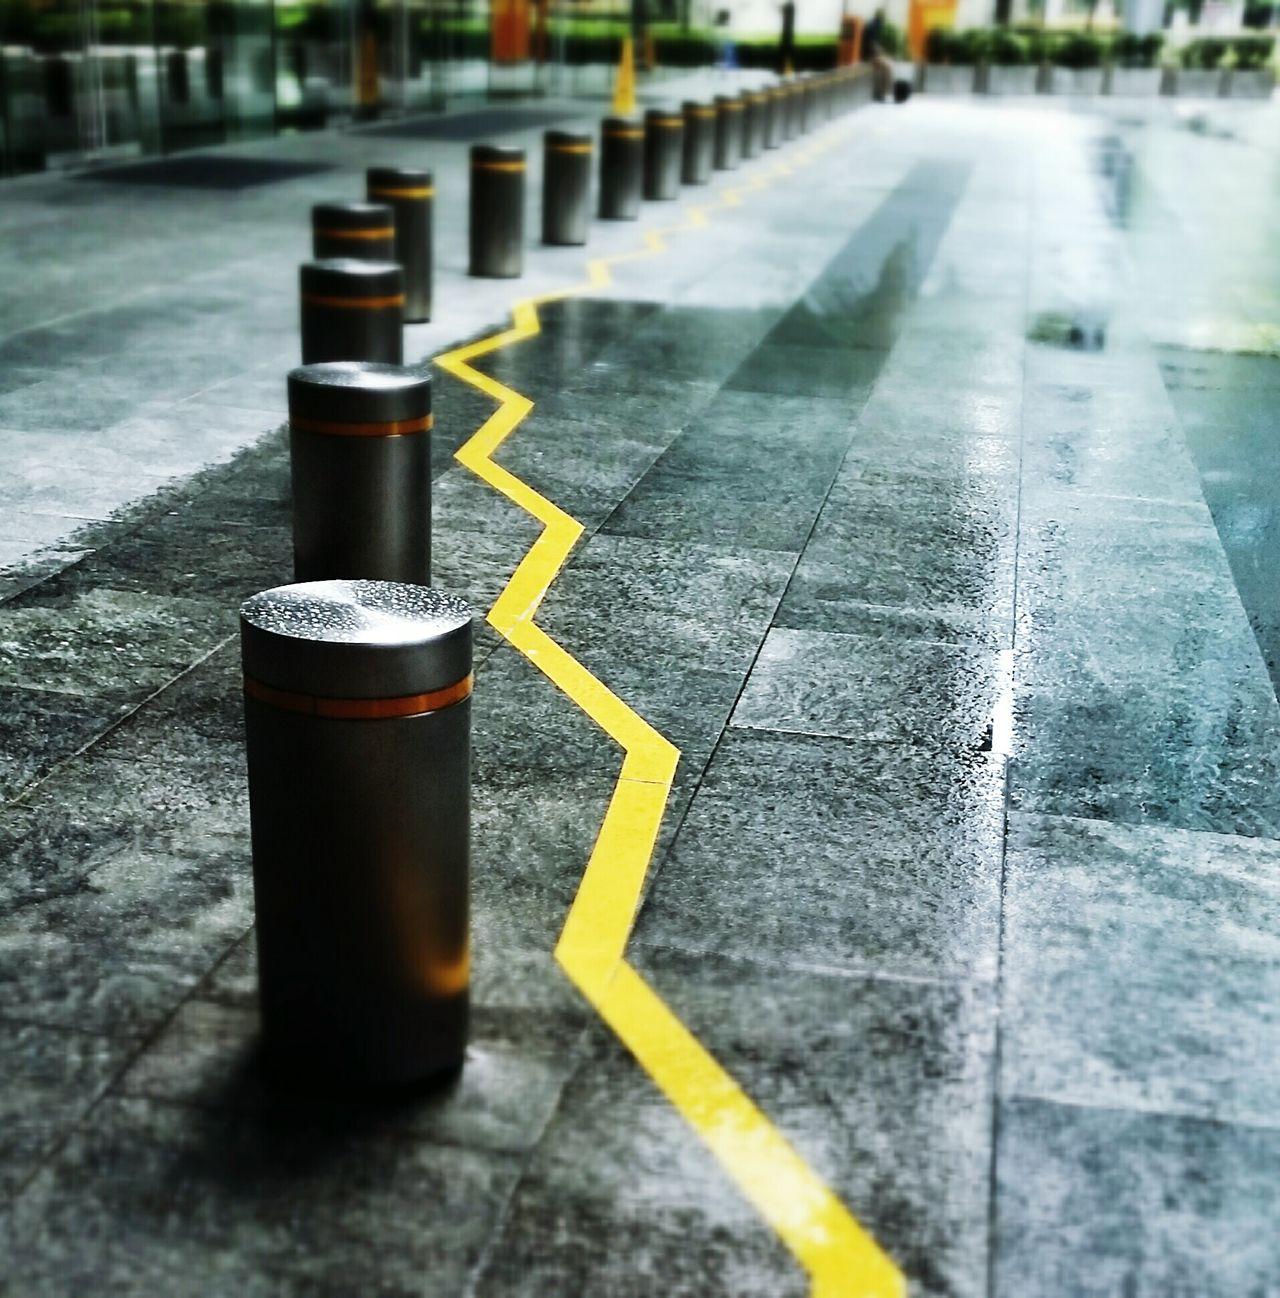 Urban Geometry Streetphotography Vanishing Point Lines Geometric Shapes The Architect - 2015 EyeEm Awards Pattern Pieces